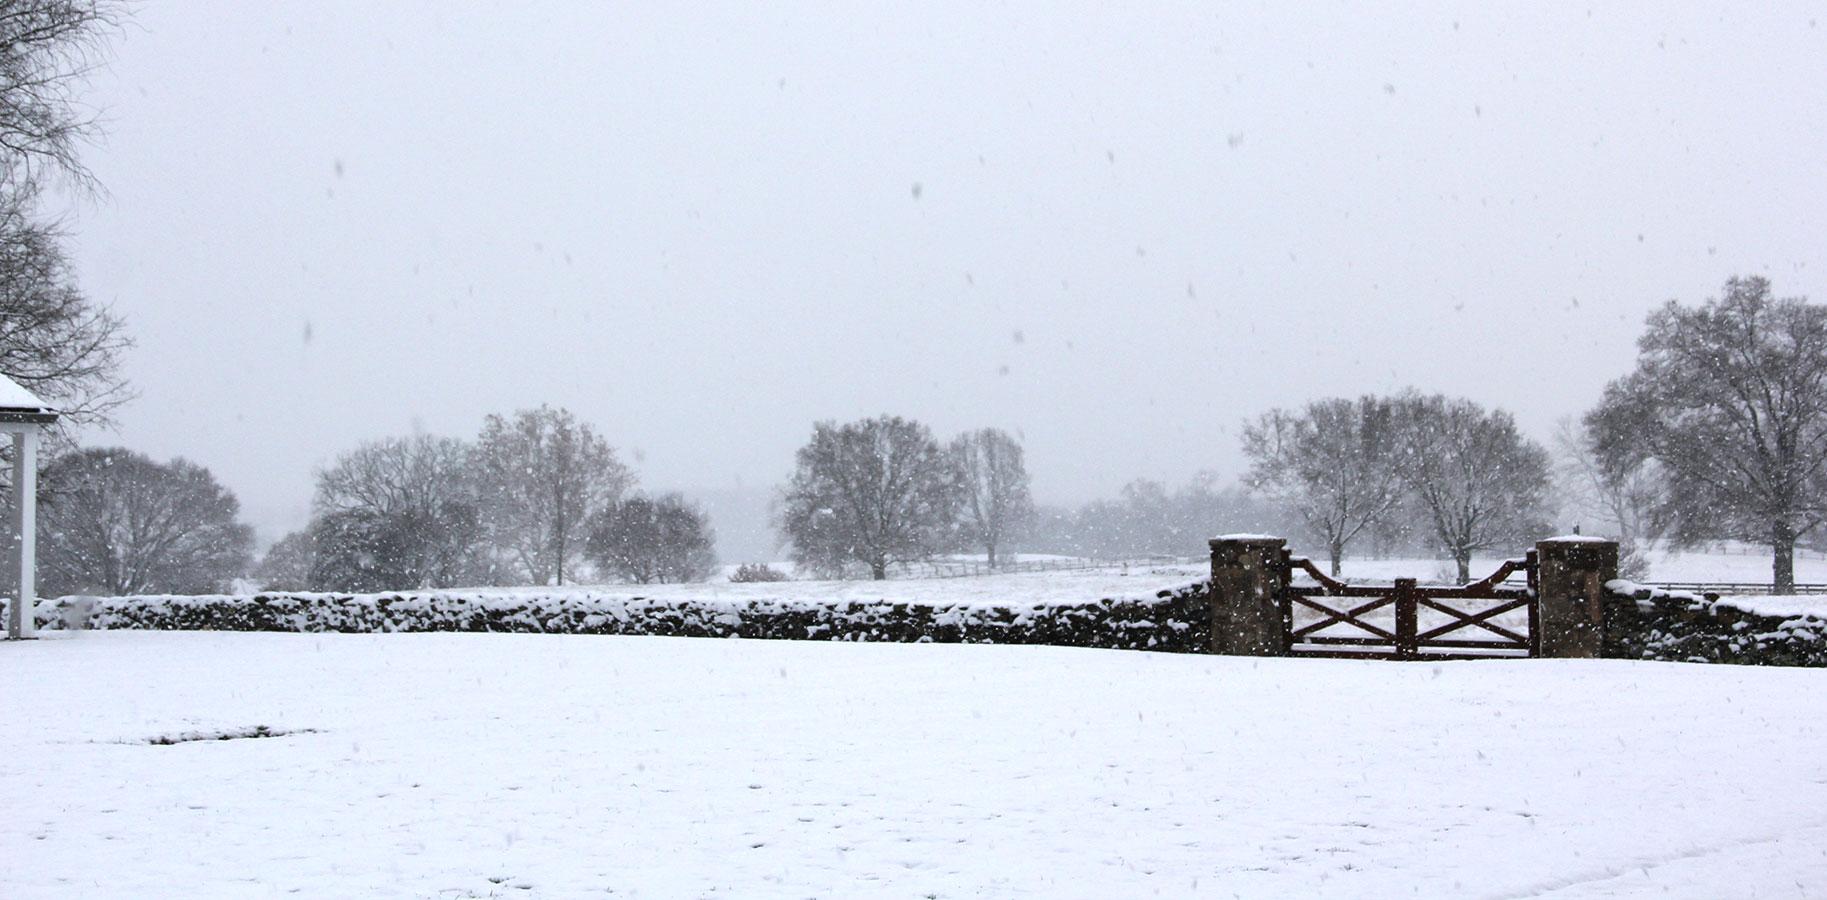 A snowy scene at Oak Spring